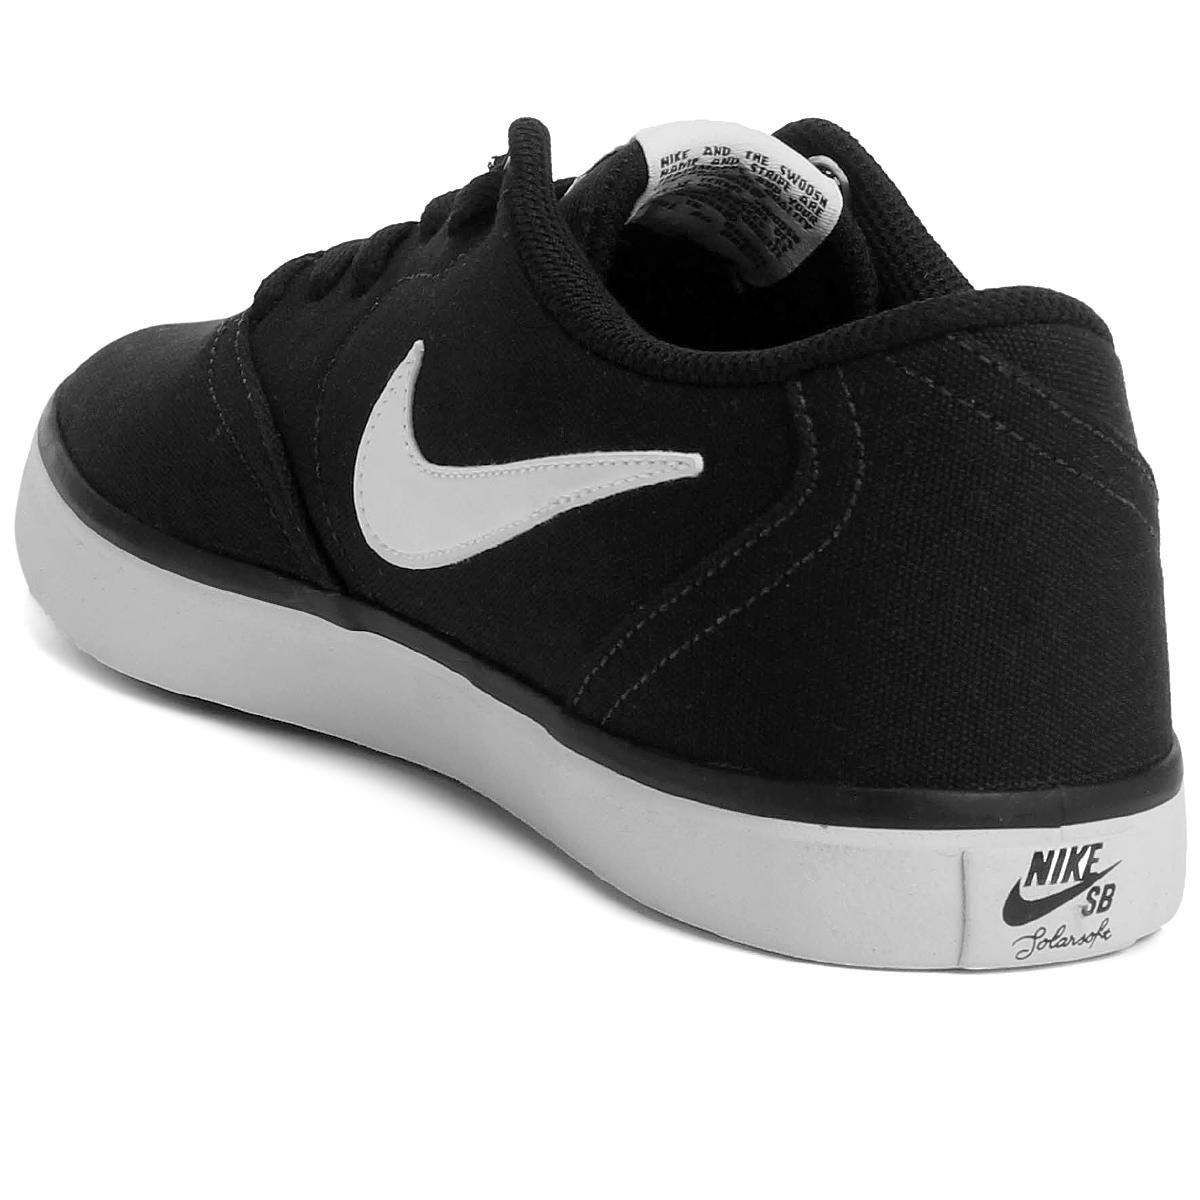 01c4c92900 Tênis Nike Sb Check Solar Cnvs Masculino - Cinza - Compre Agora ...